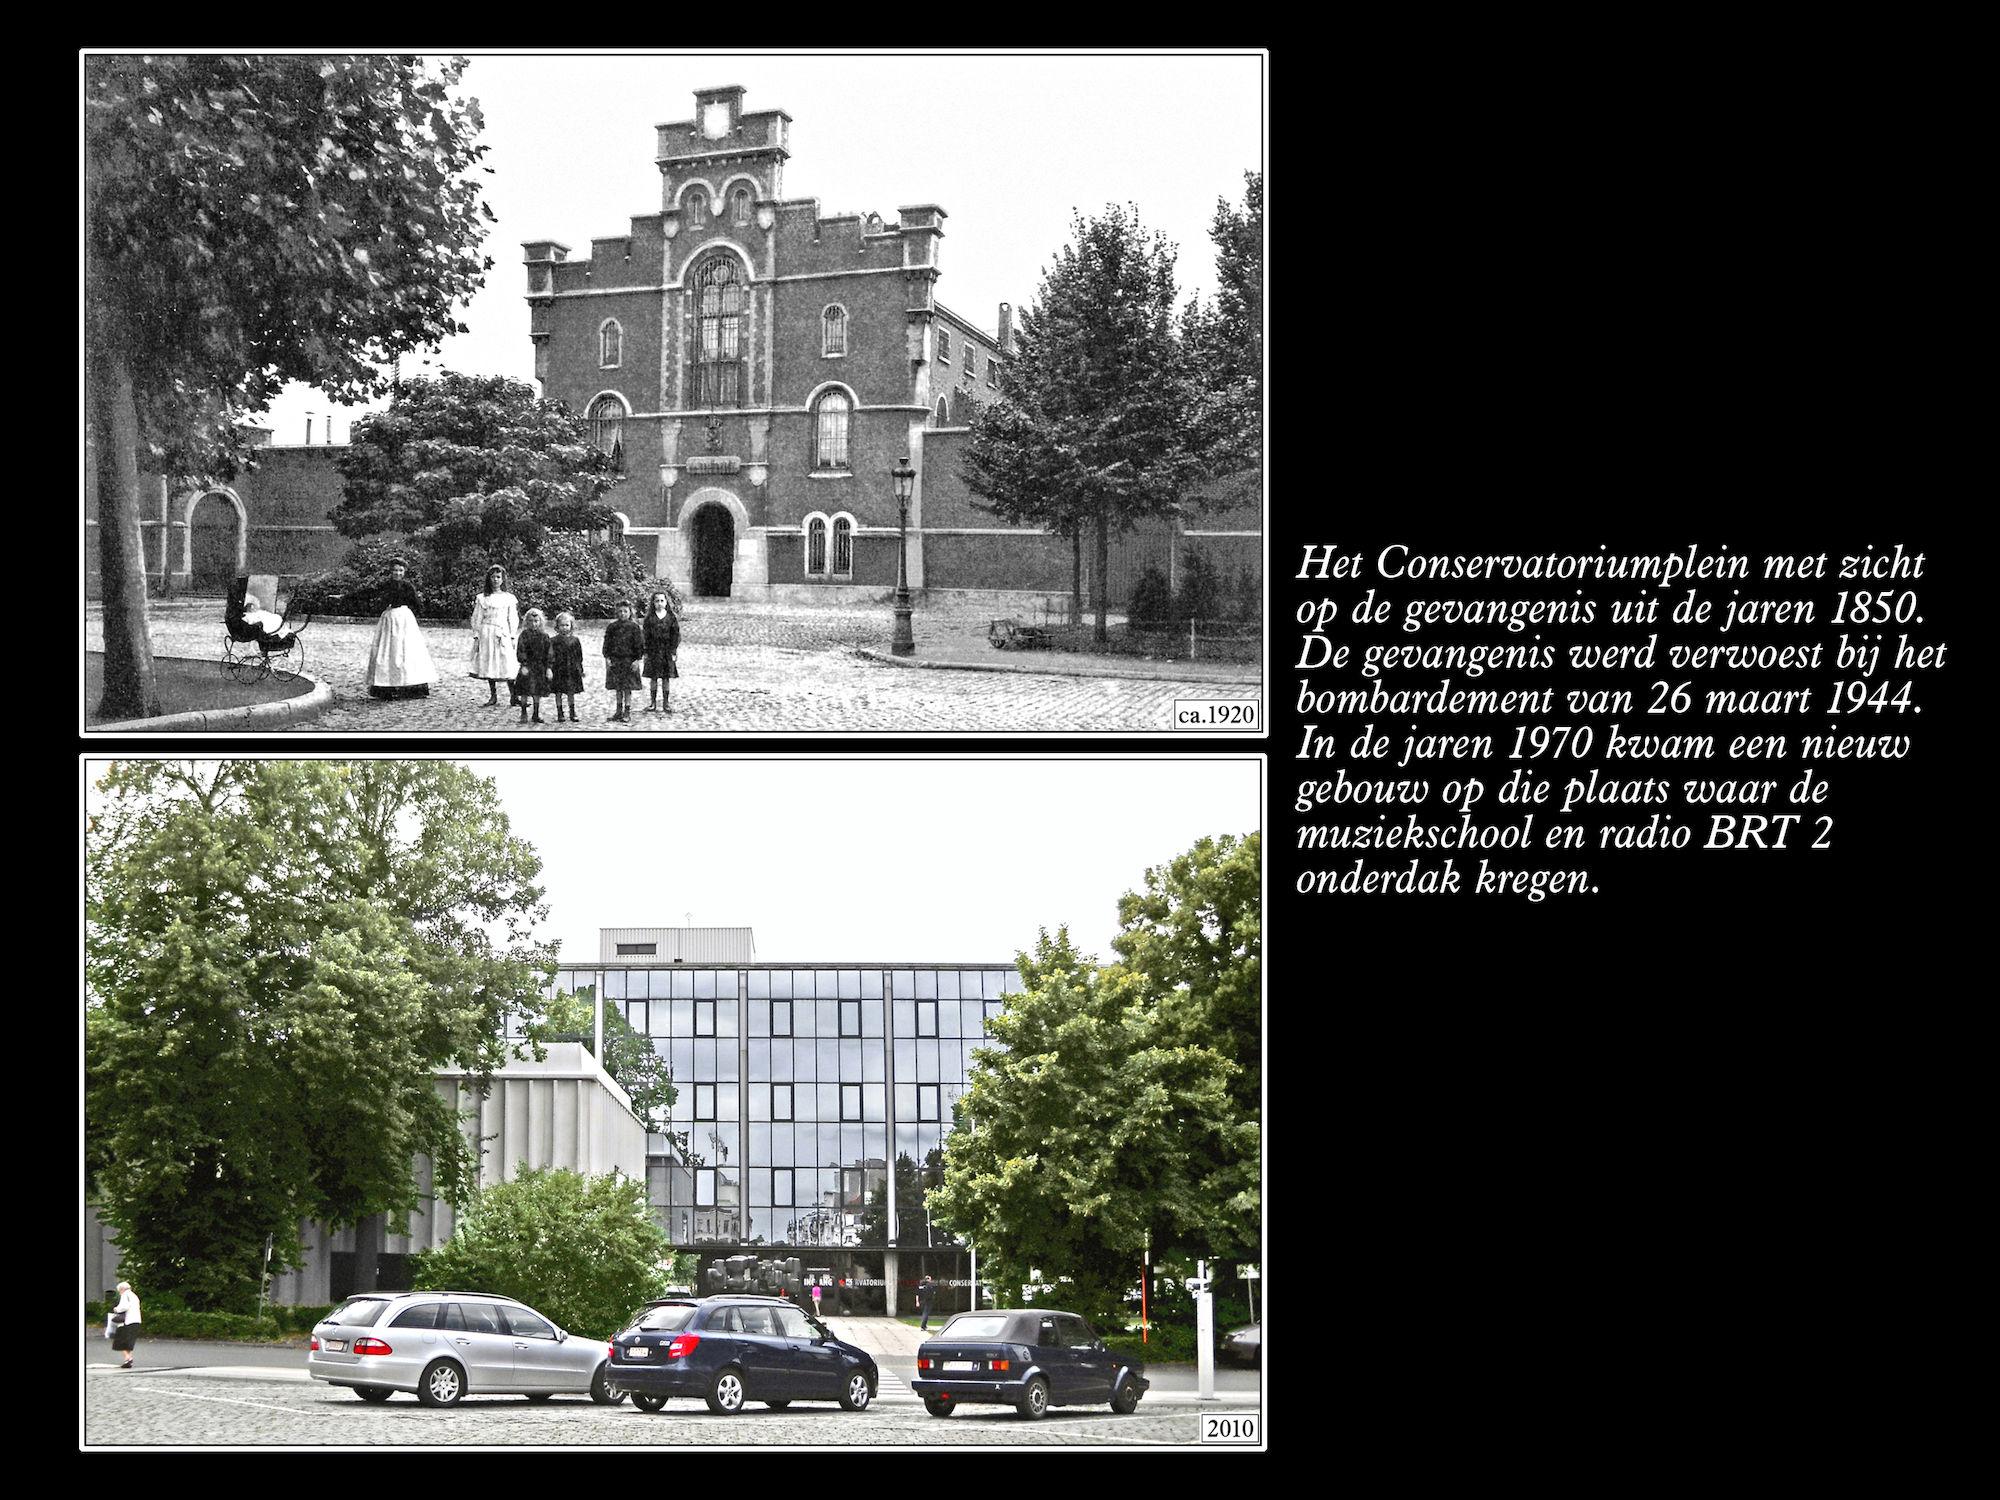 6Conservatoriumplein ca 1920 en 2010